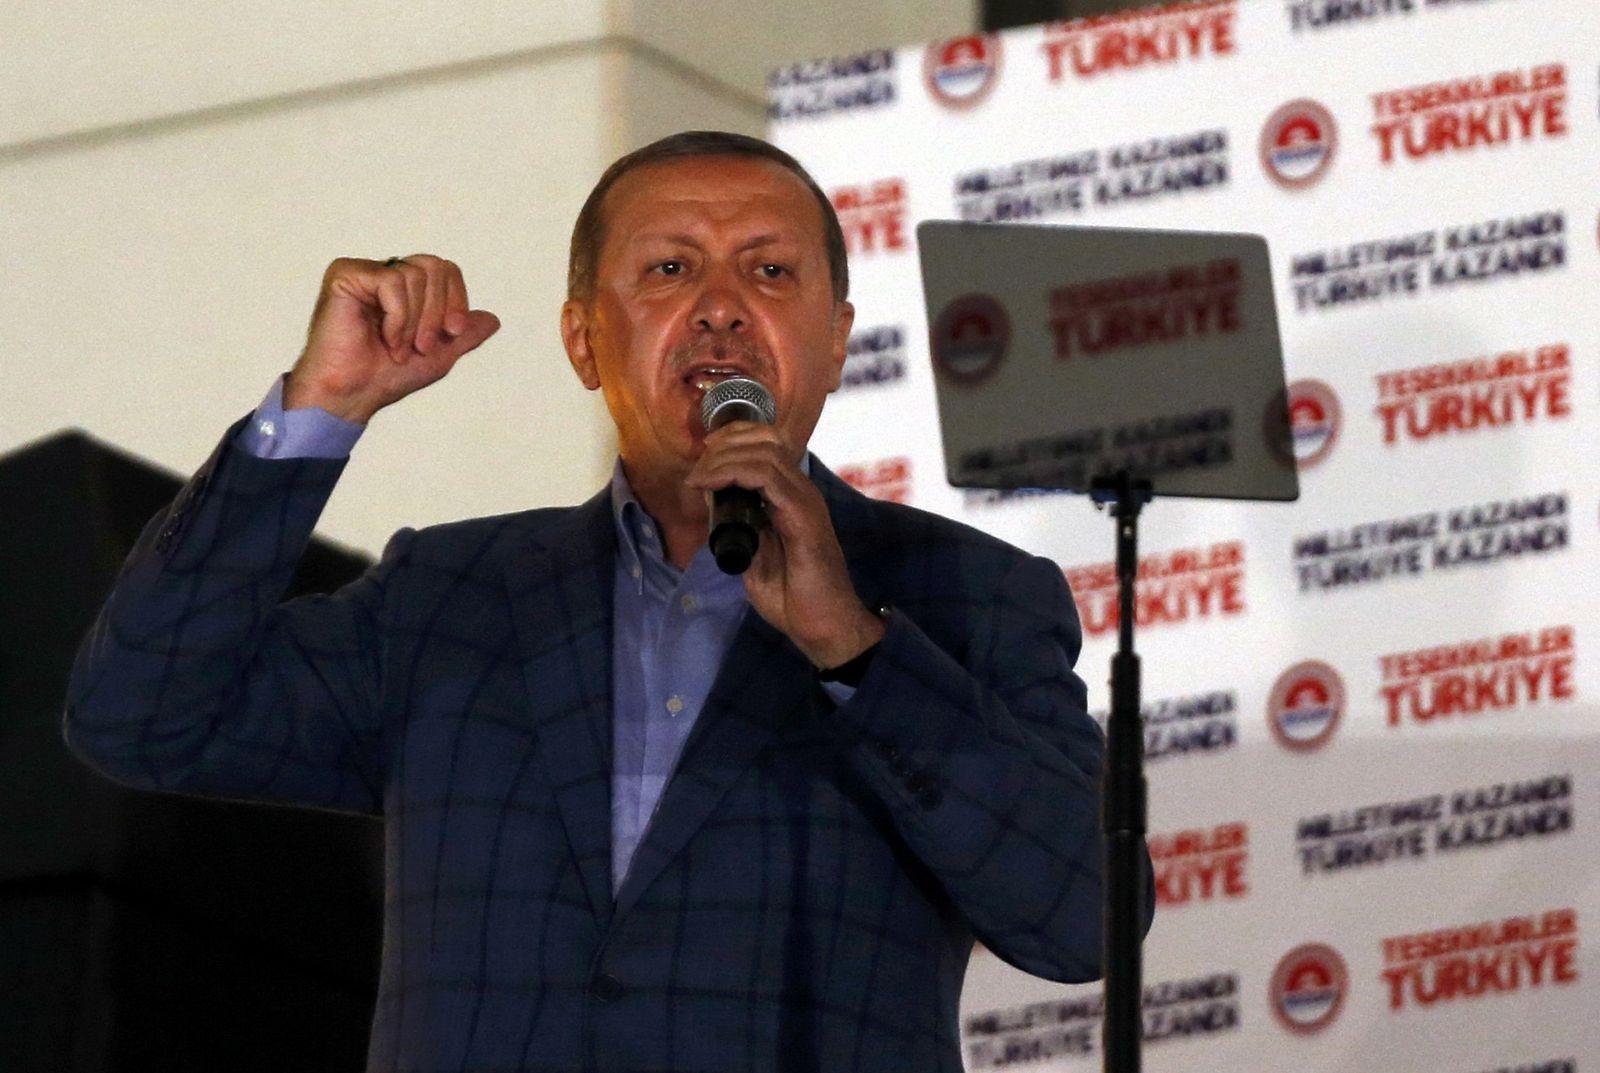 TURKEY-ELECTION/